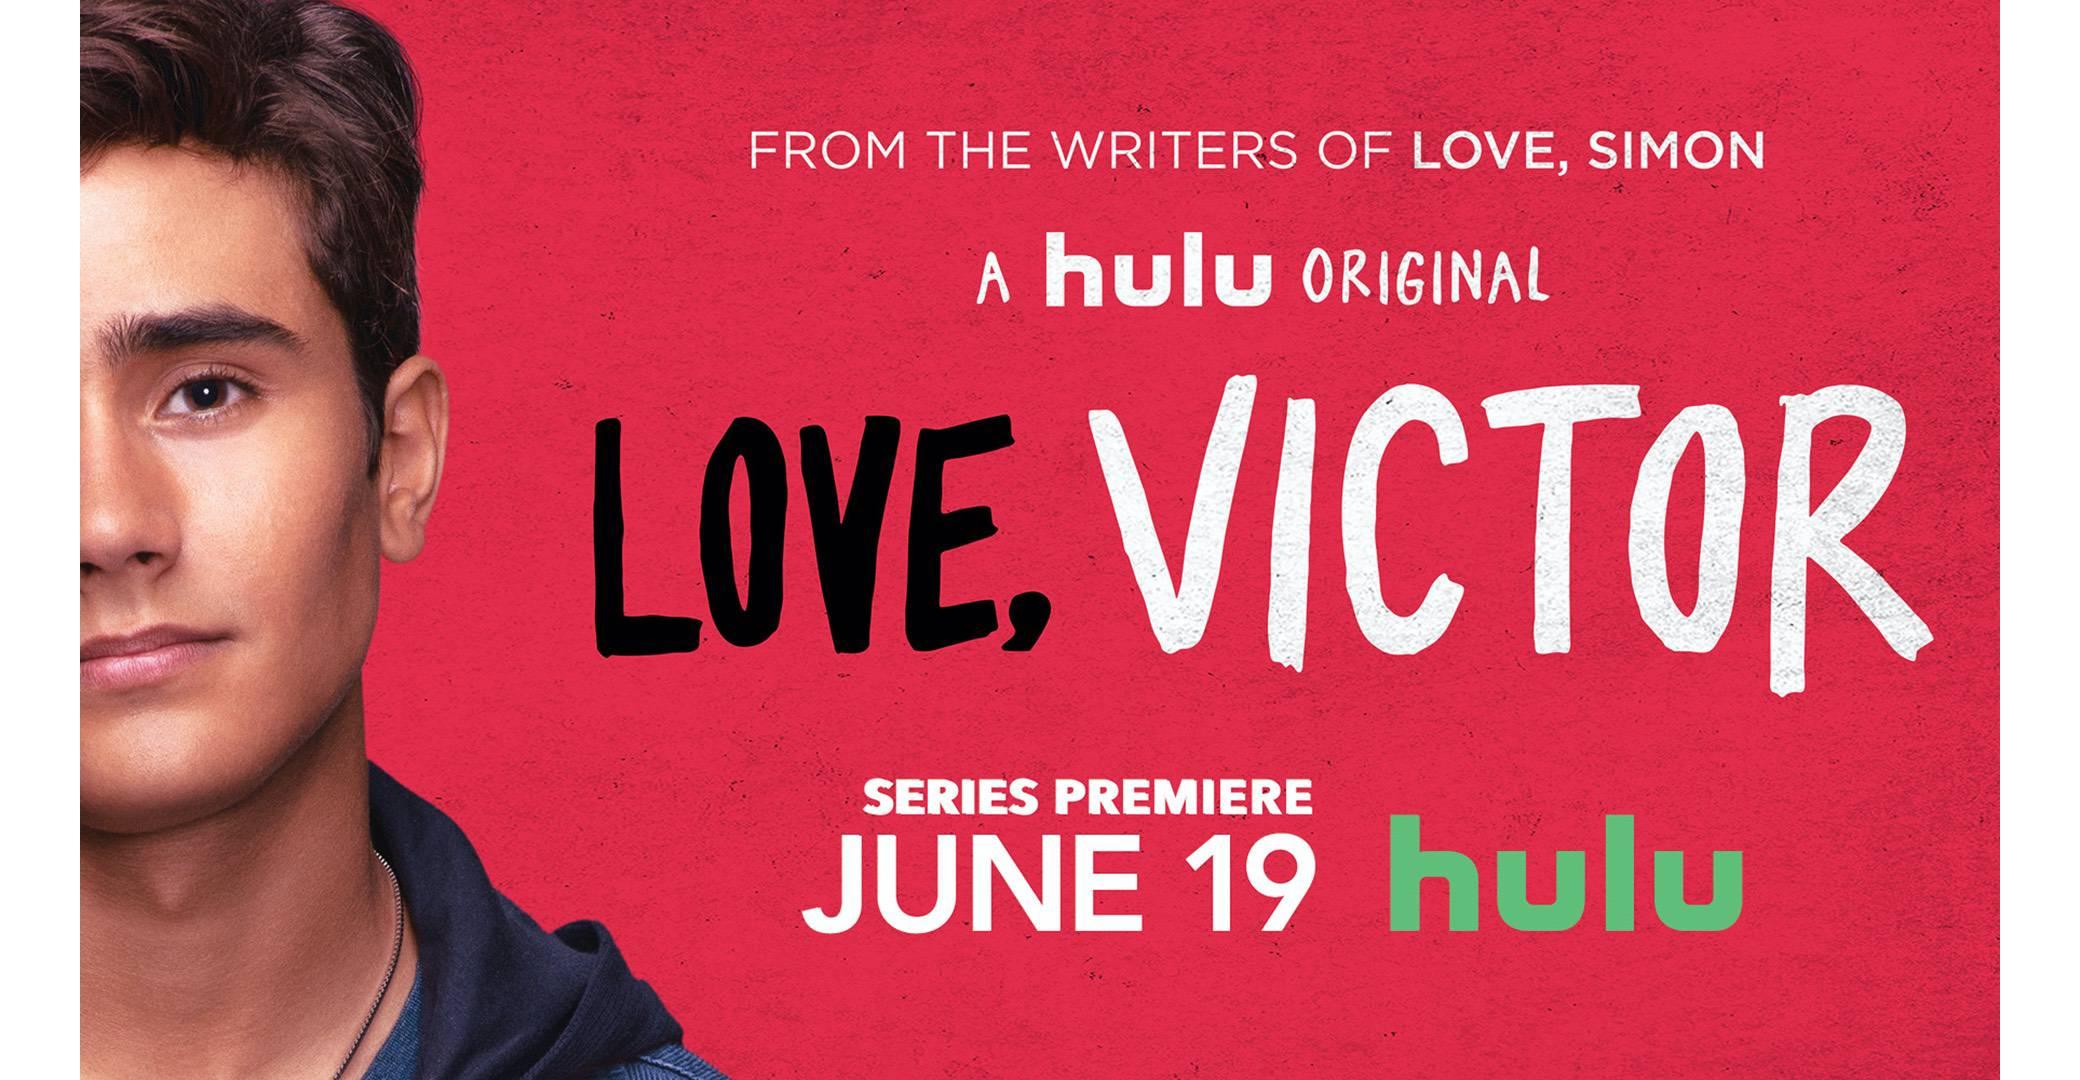 love-victor image